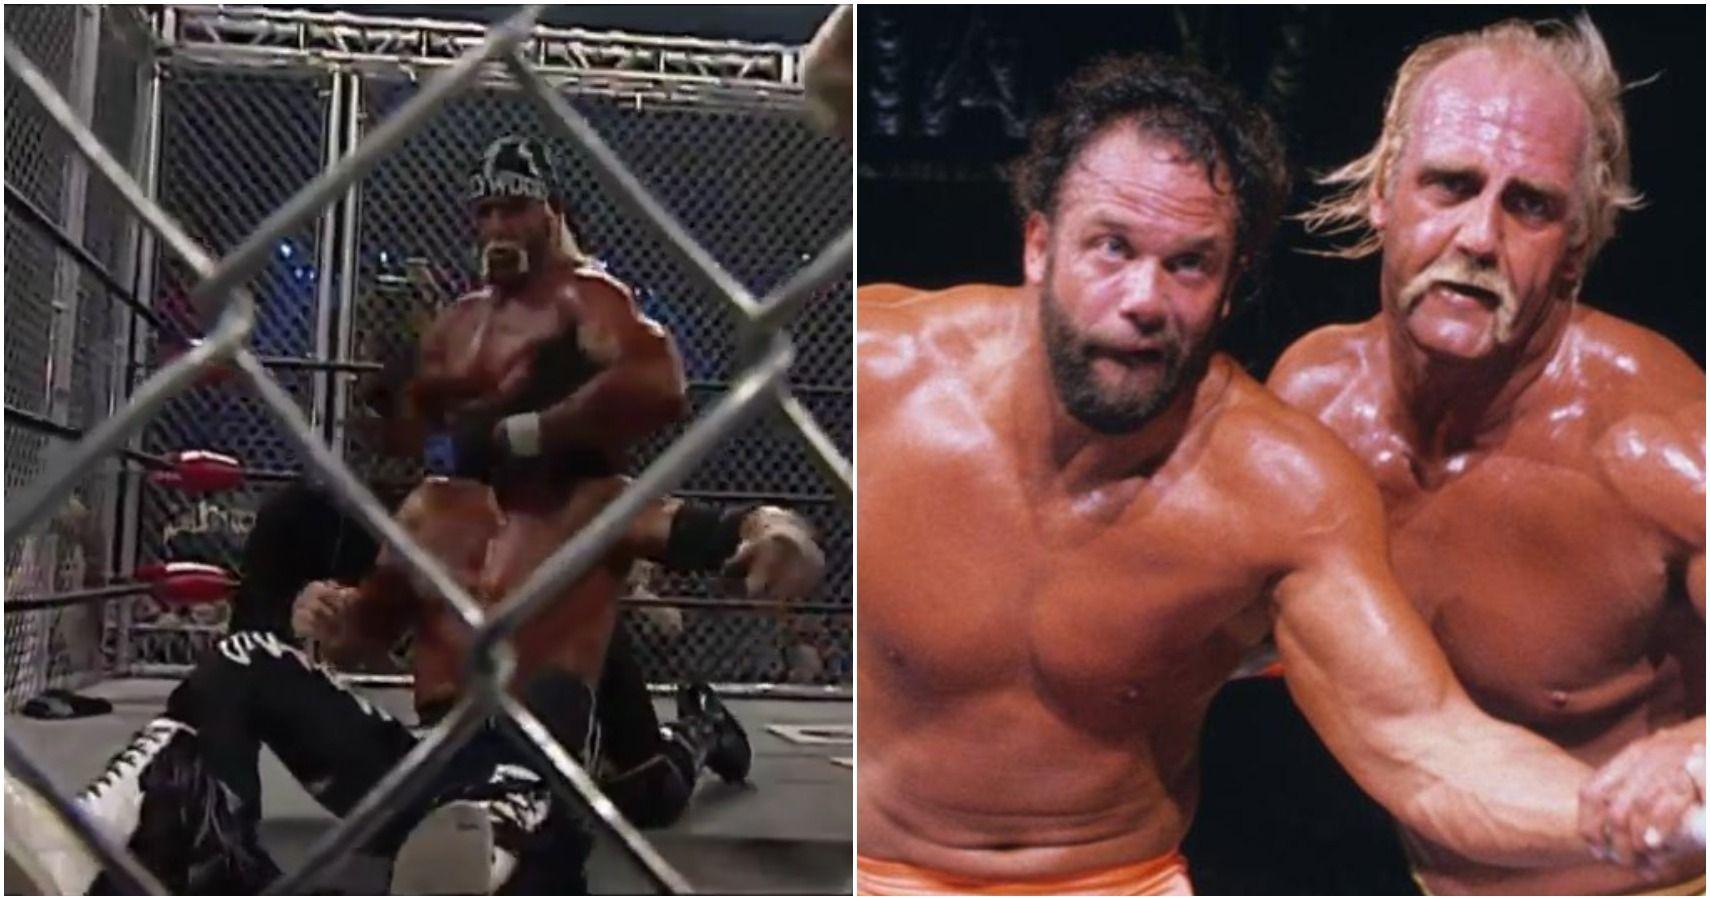 Every Major Hulk Hogan vs. Randy Savage Match, Ranked